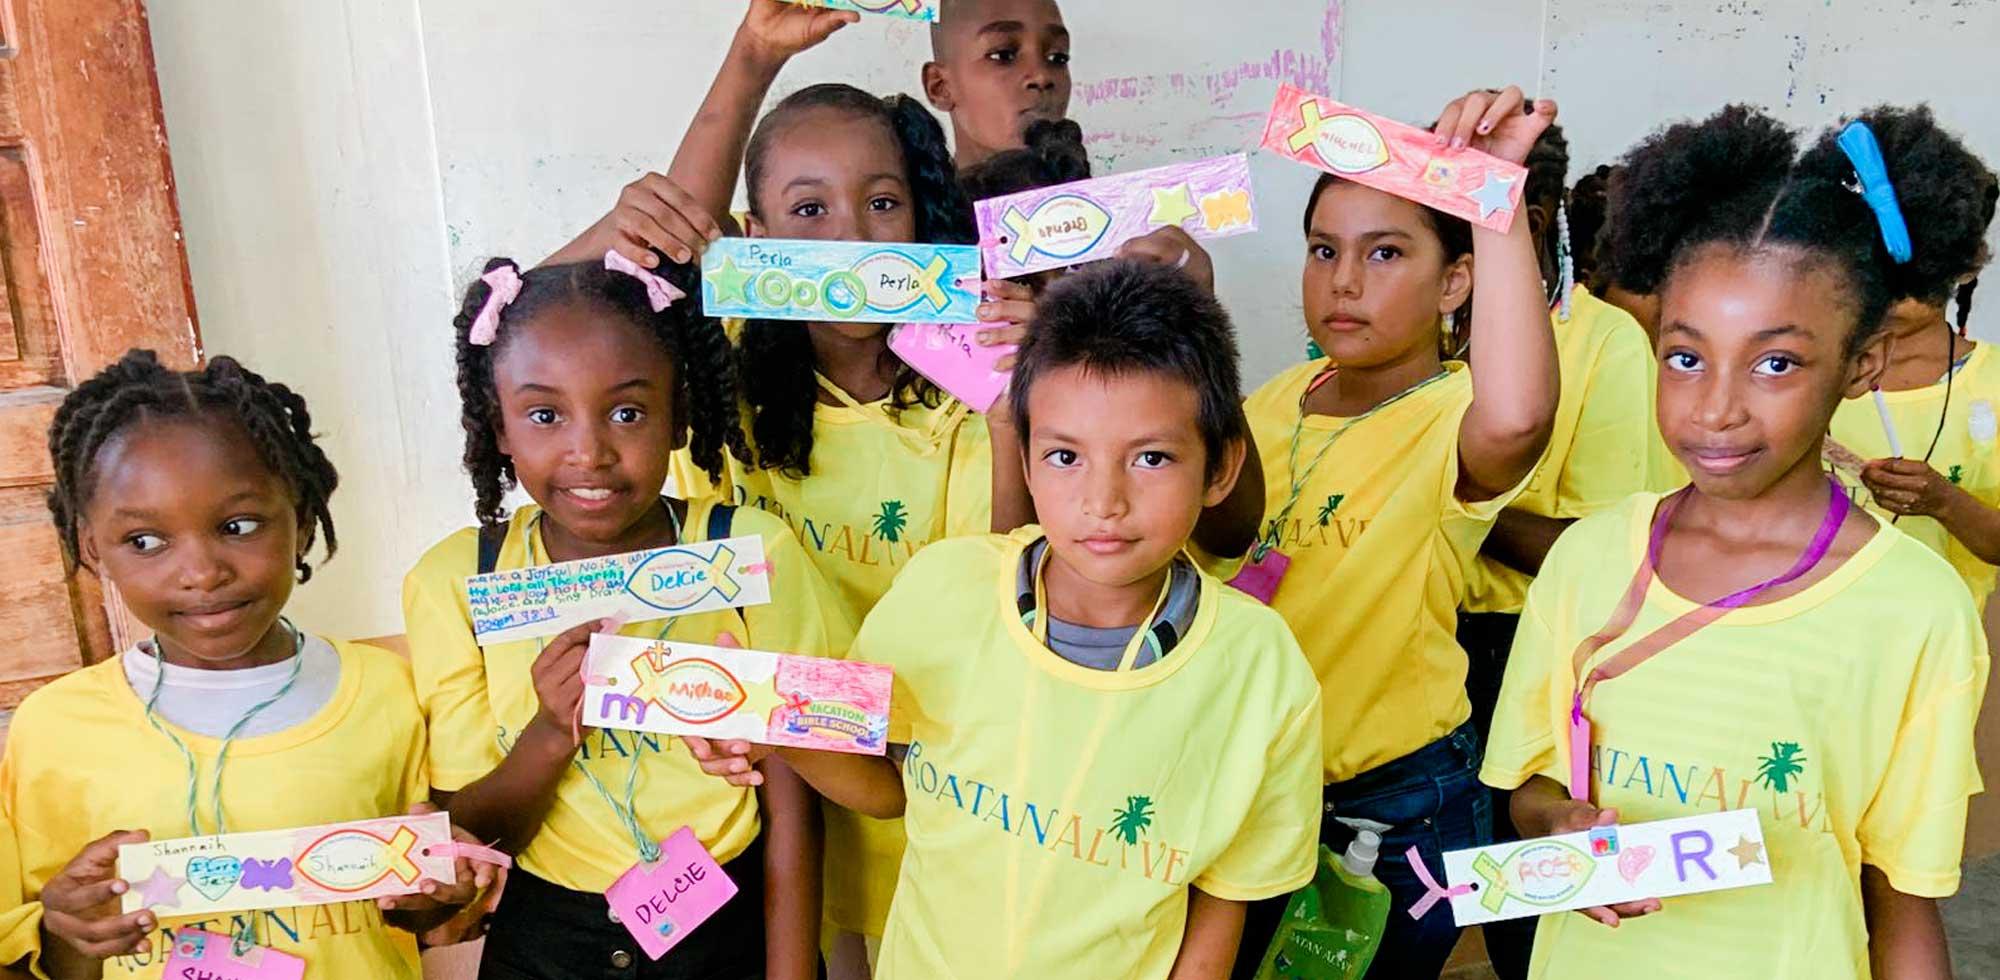 Kids in a classroom in Roatan, Honduras